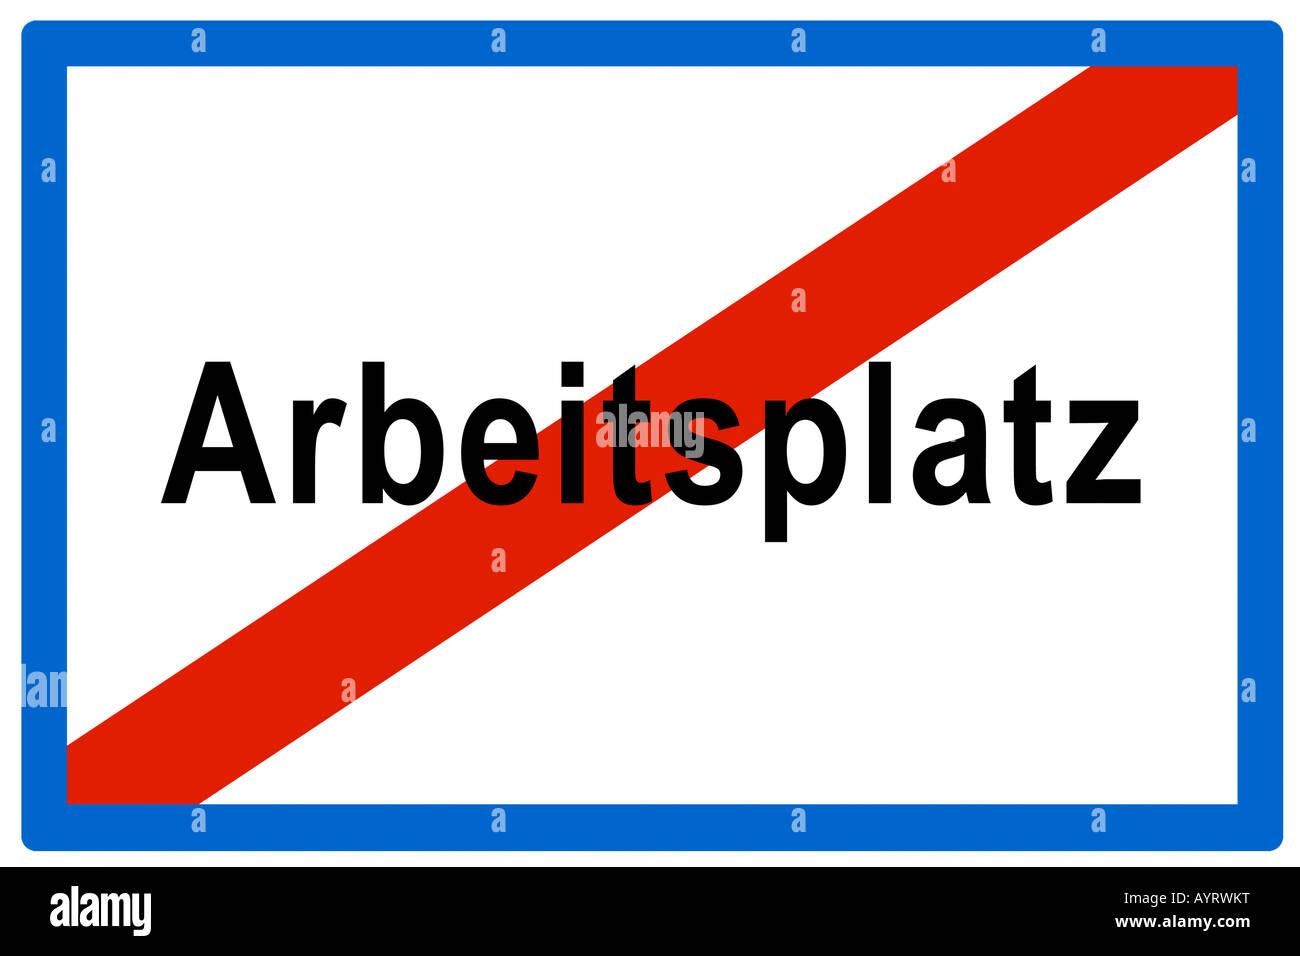 No Arbeitsplatz (Ger. for job openings), symbolic sign Stock Photo